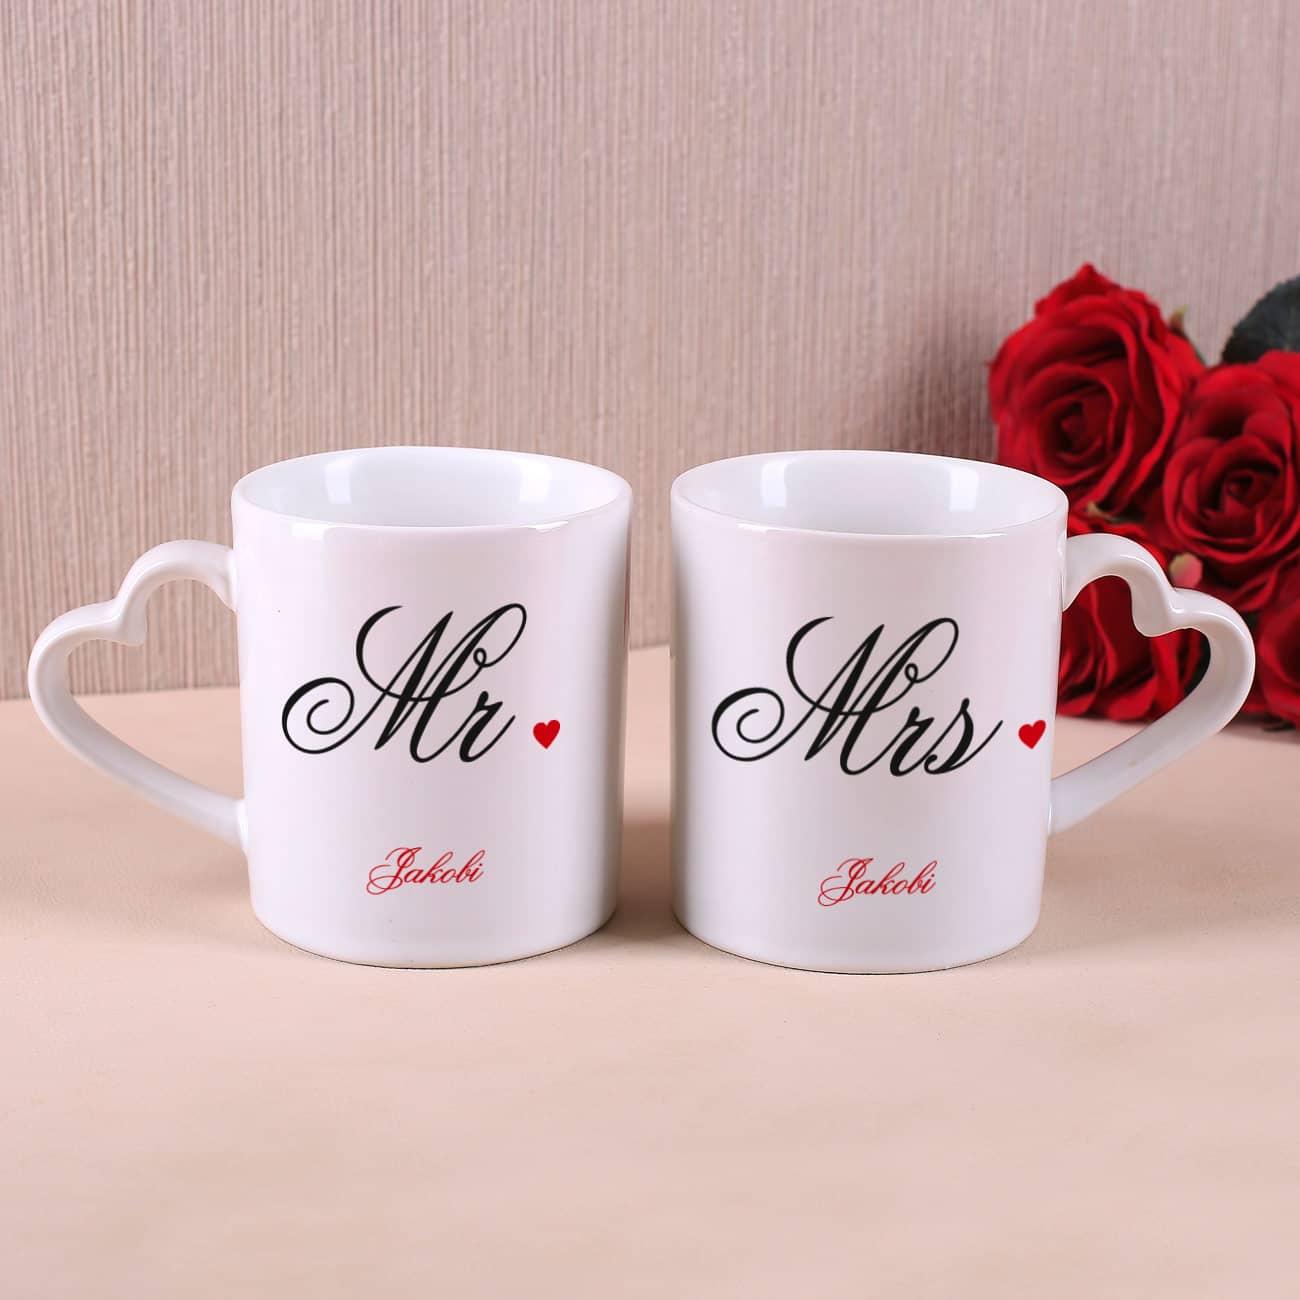 romantische geschenke geschenkideen mit romantik. Black Bedroom Furniture Sets. Home Design Ideas